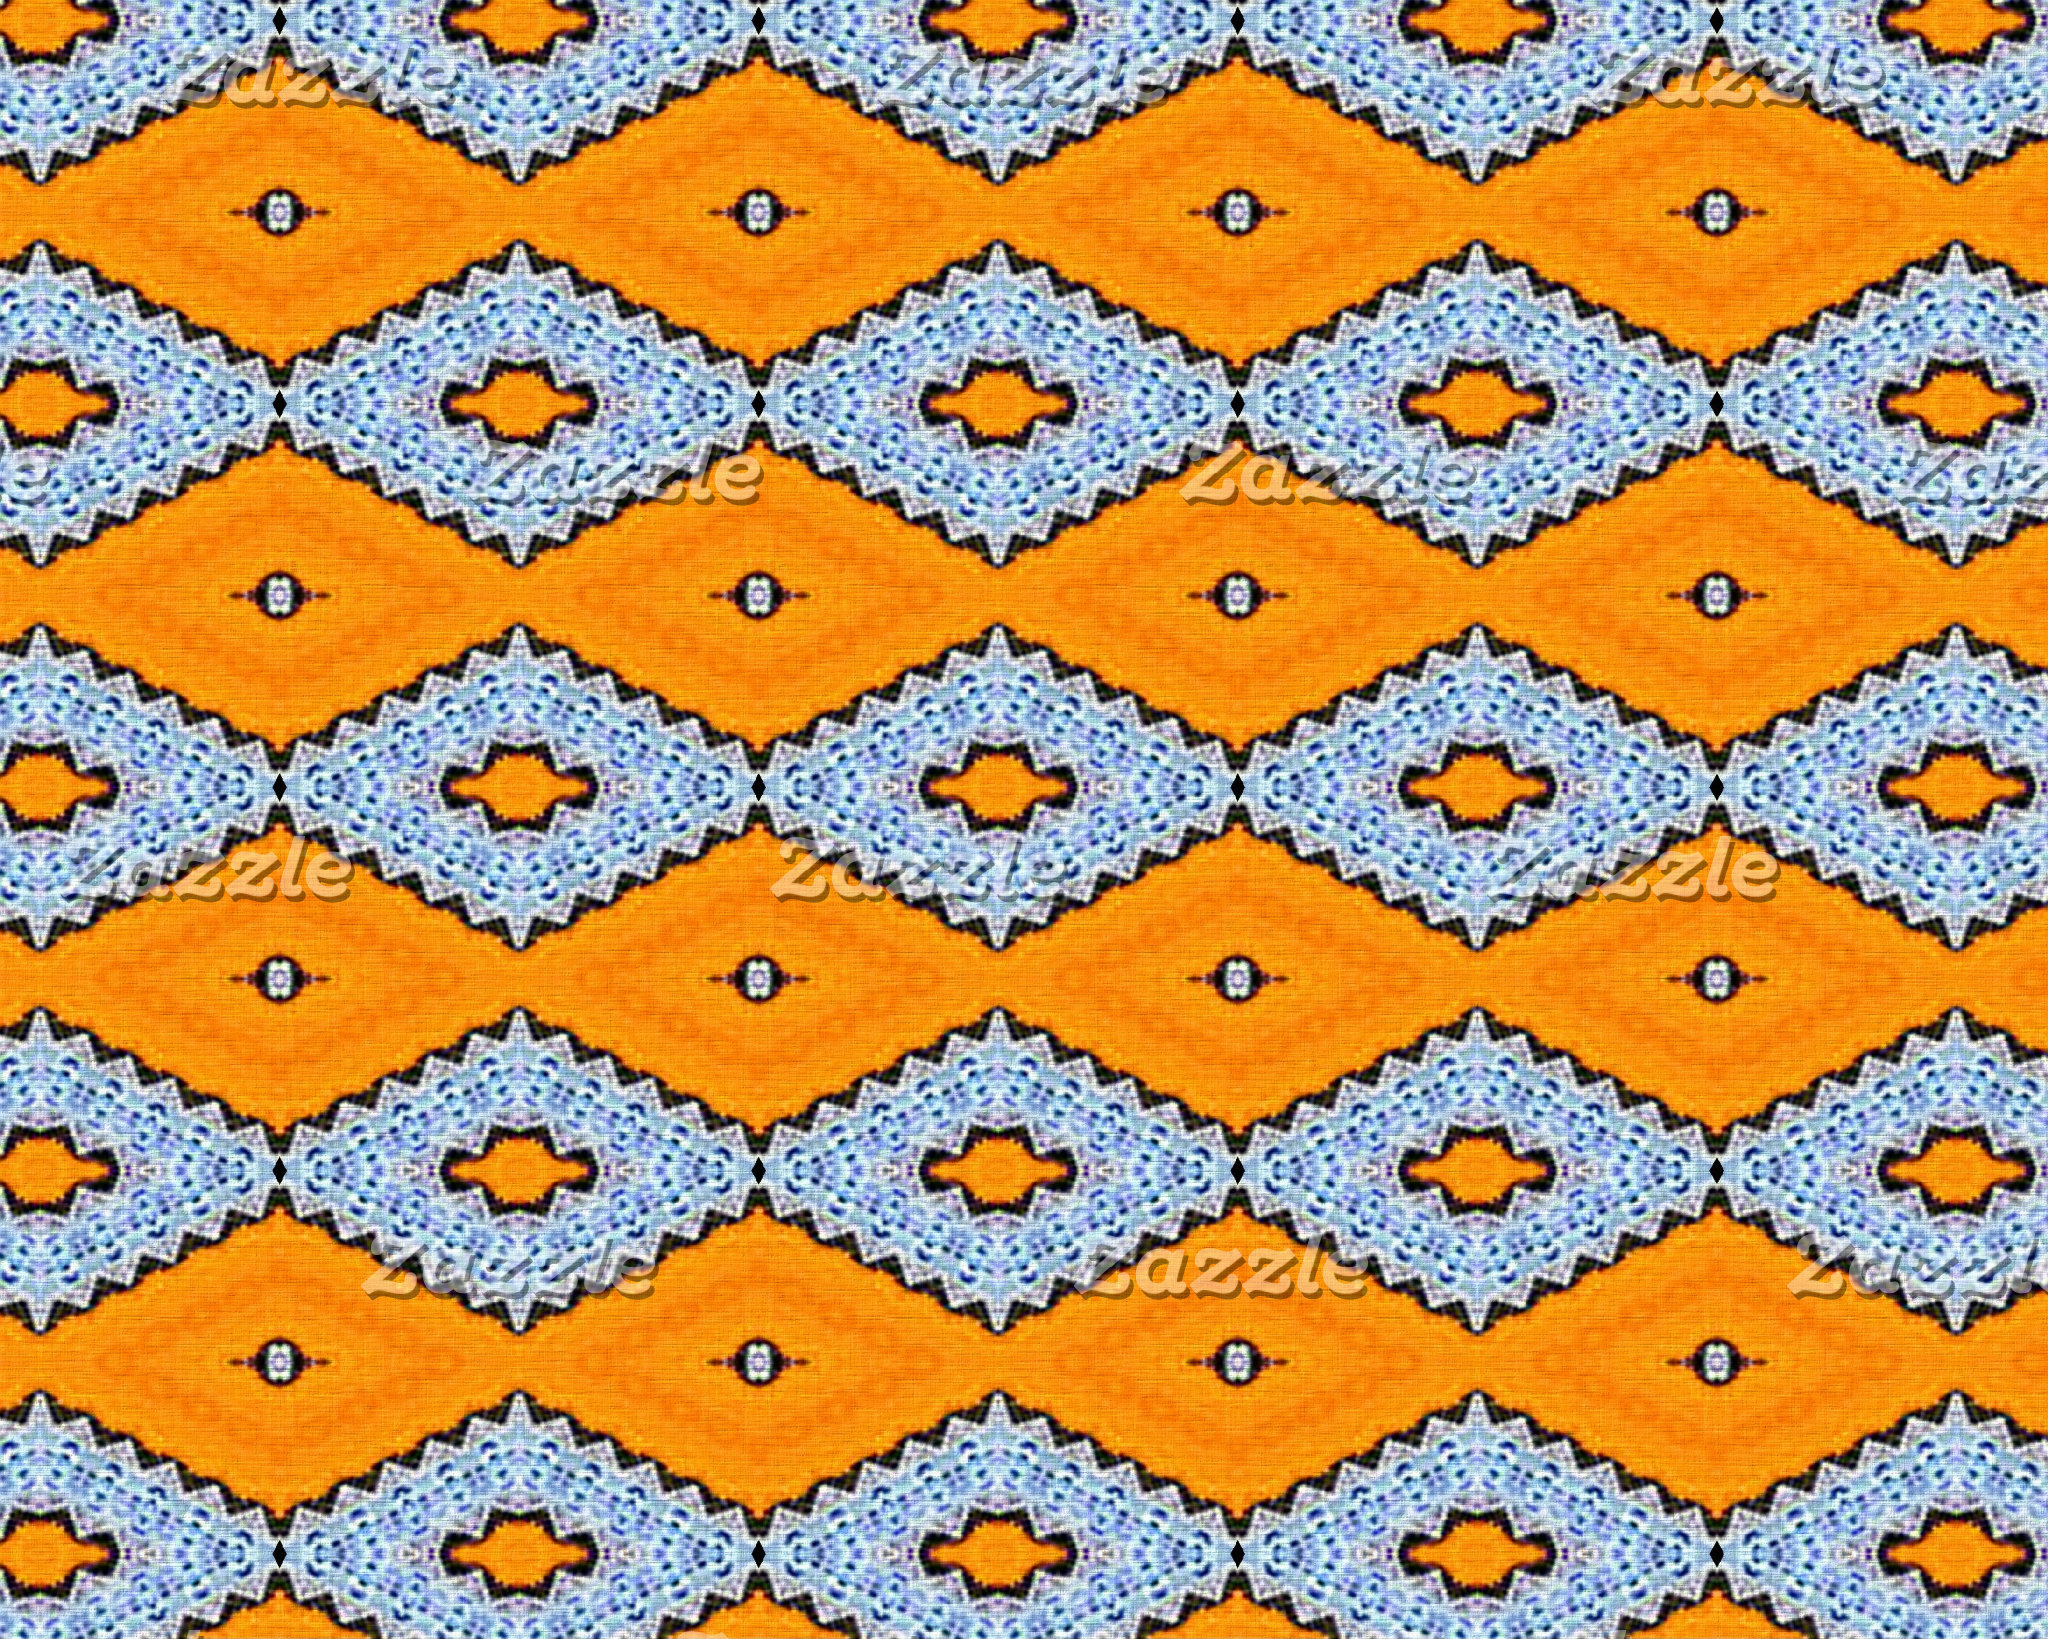 Patterns Galore!